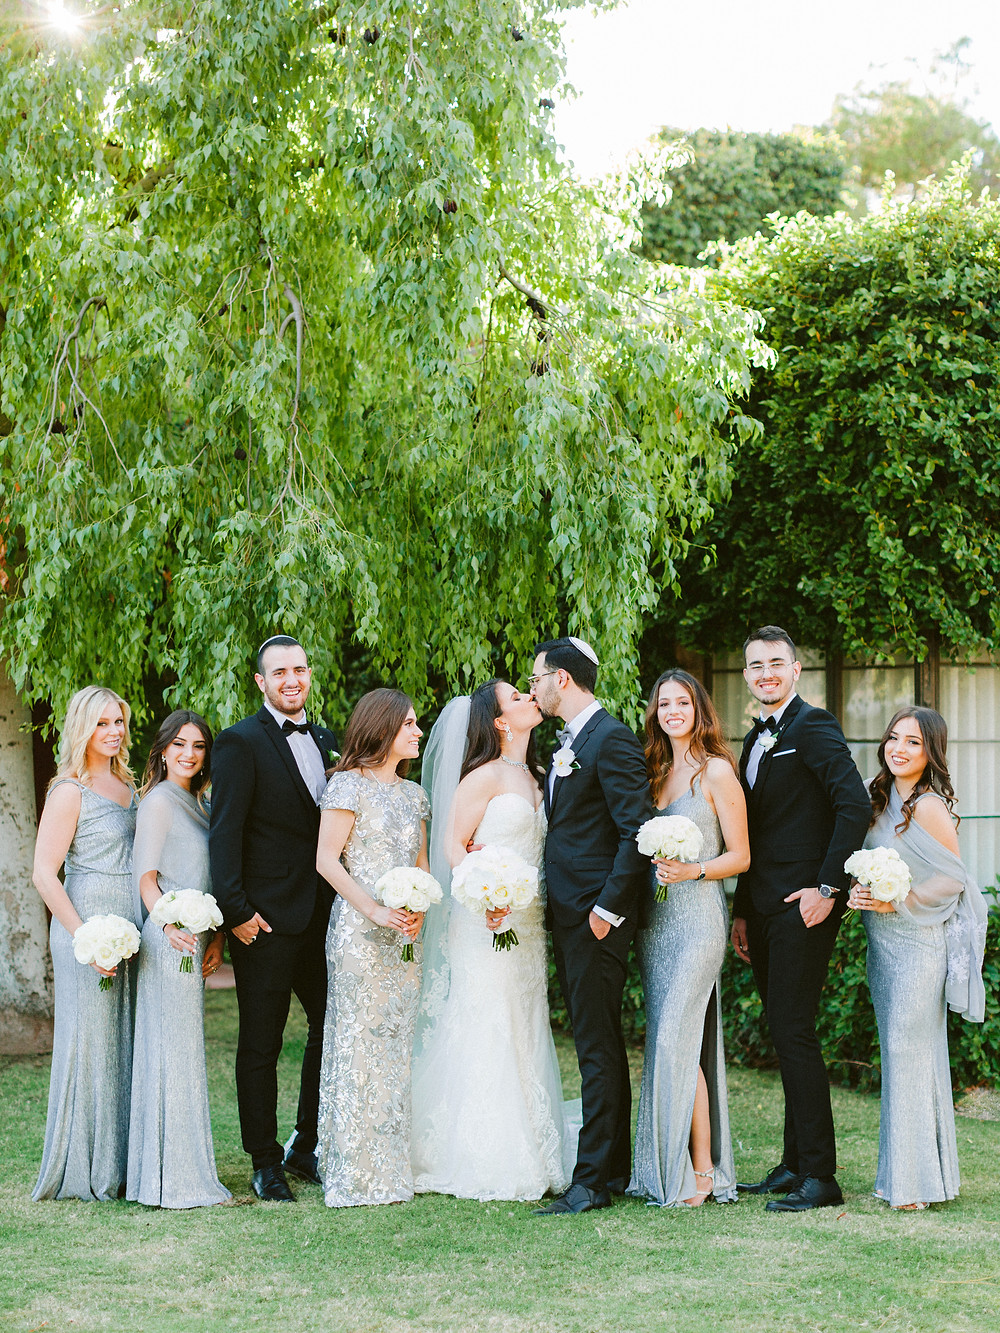 Arizona Biltmore Classic White Wedding, Bridal Party